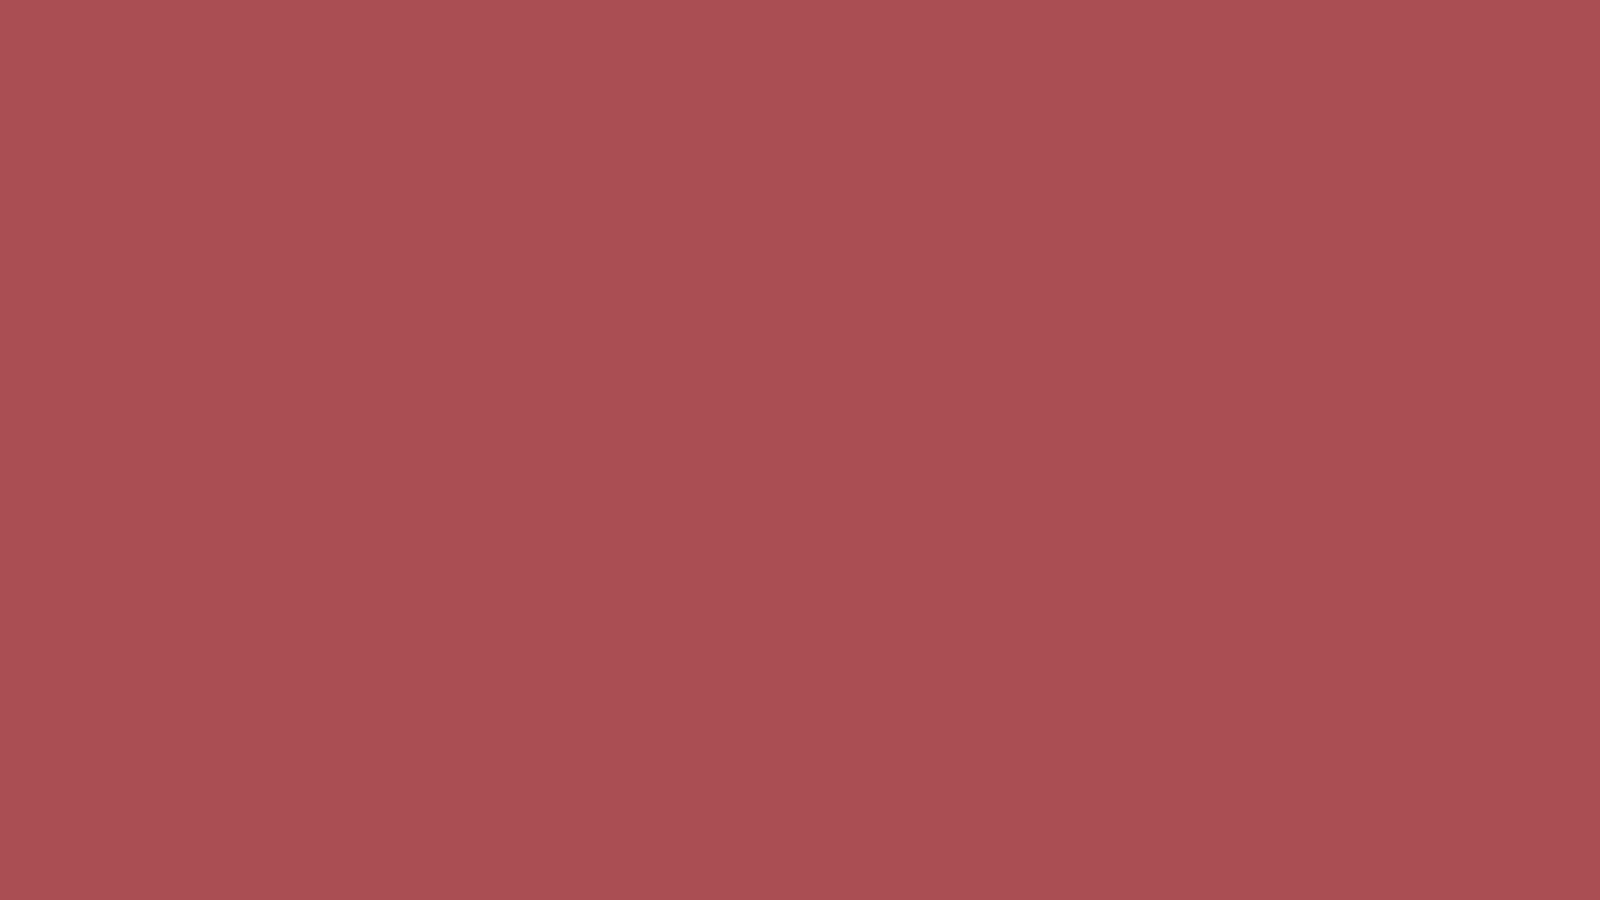 1600x900 Rose Vale Solid Color Background